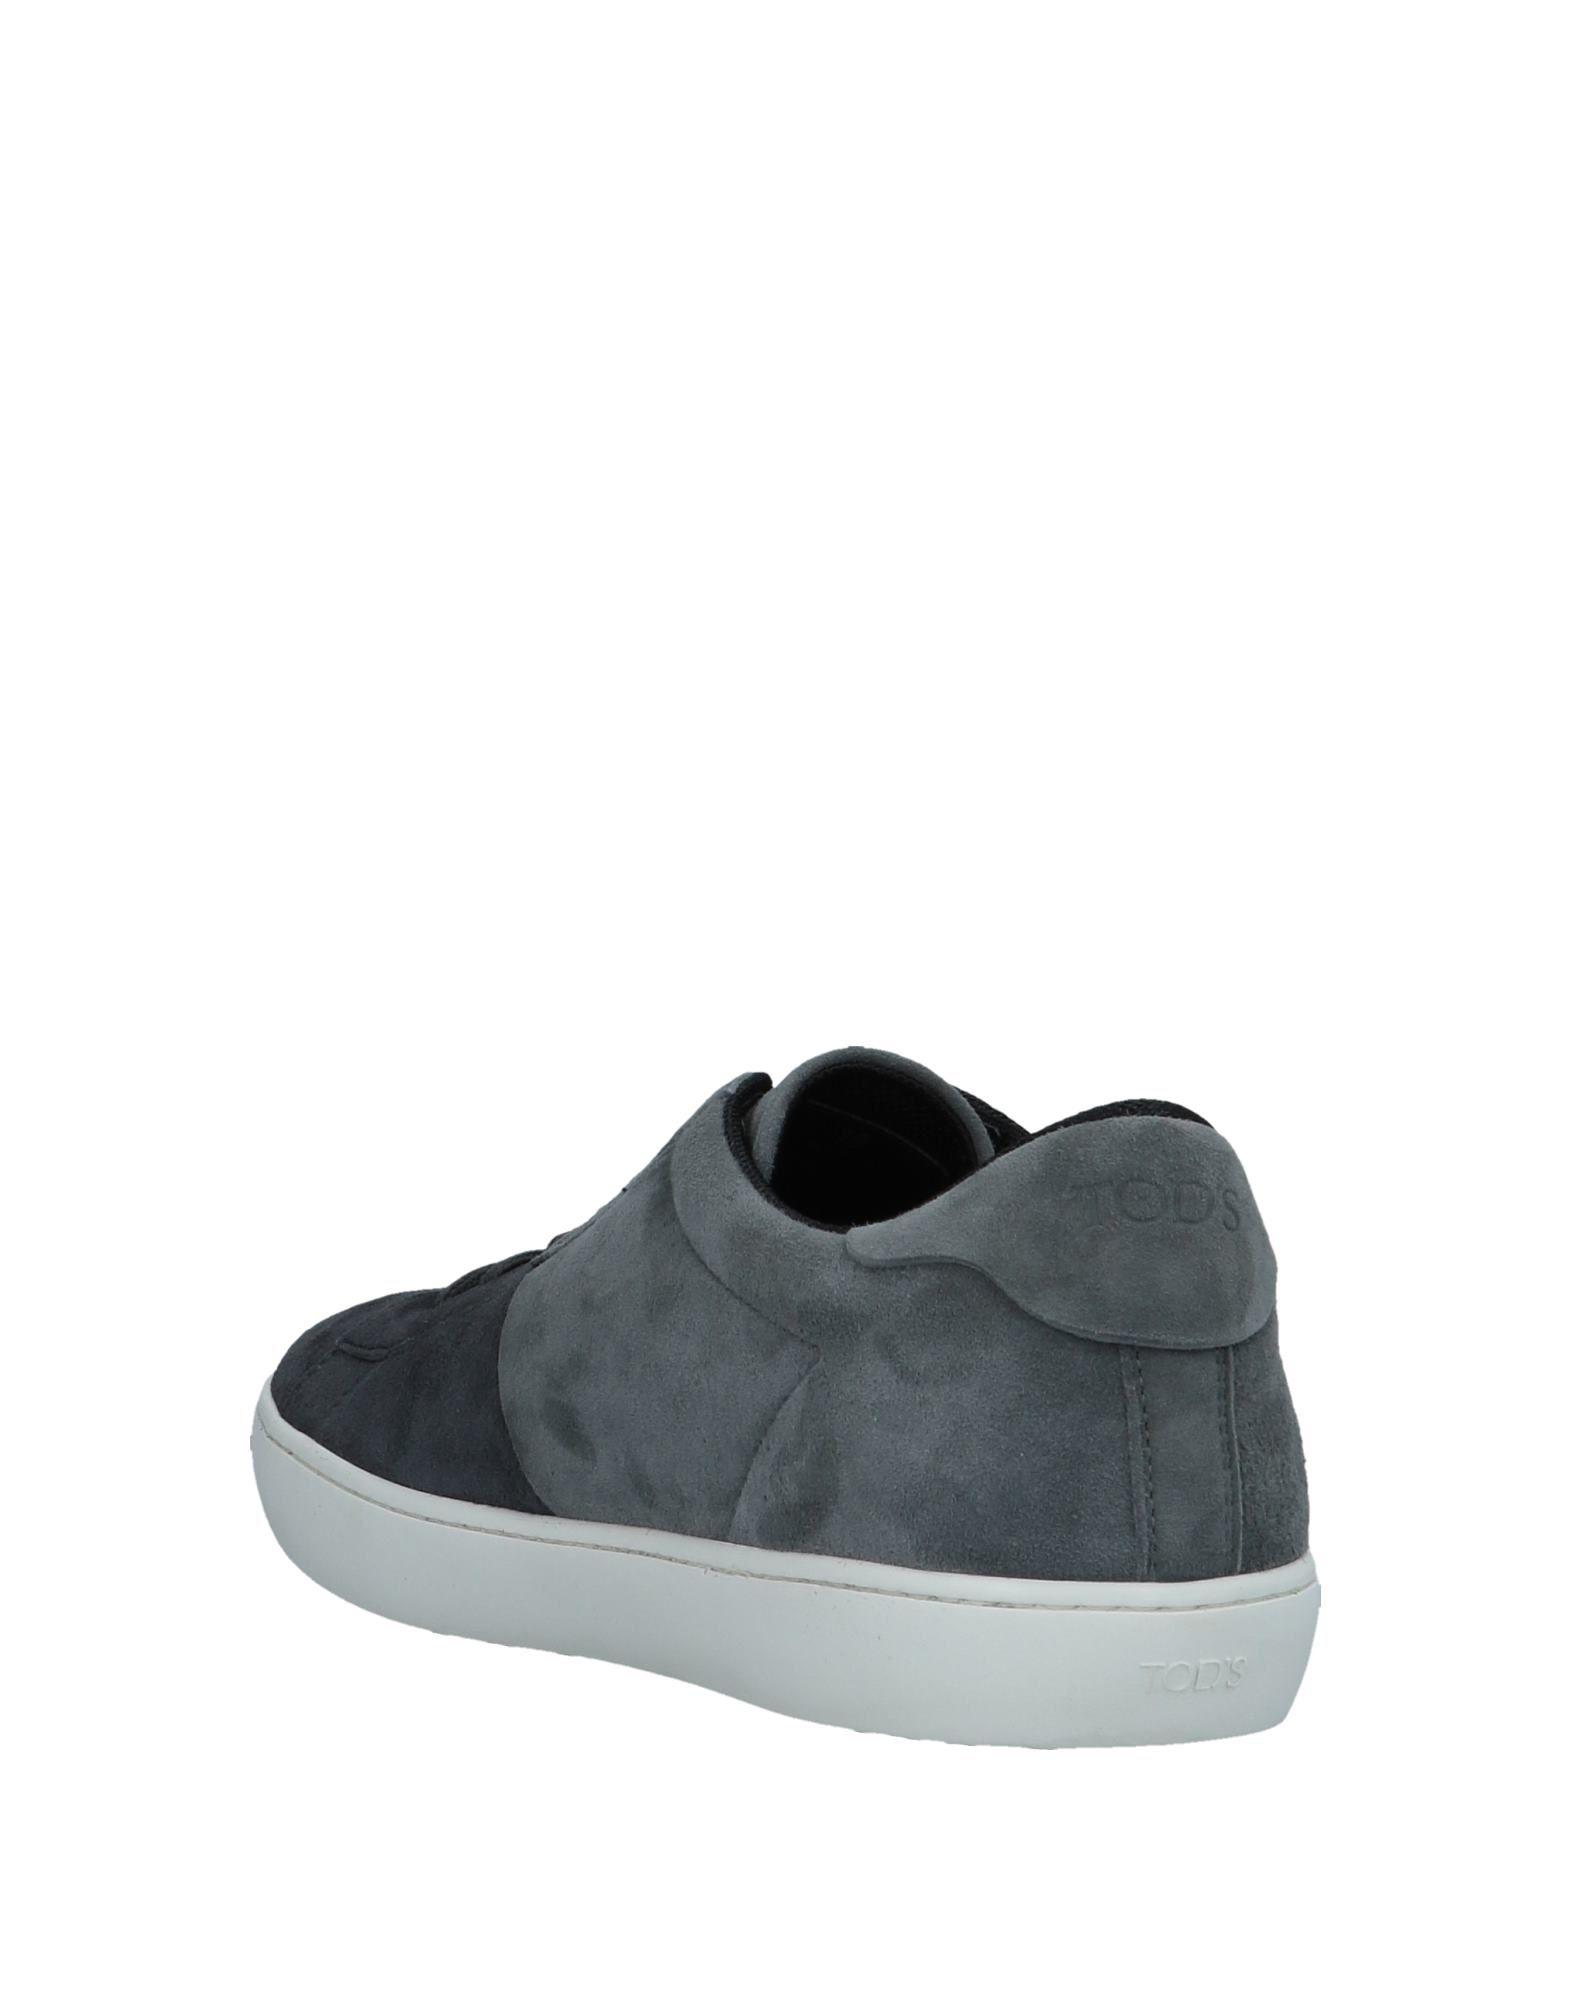 Tod's Heiße Sneakers Herren  11540705MV Heiße Tod's Schuhe e2d6db